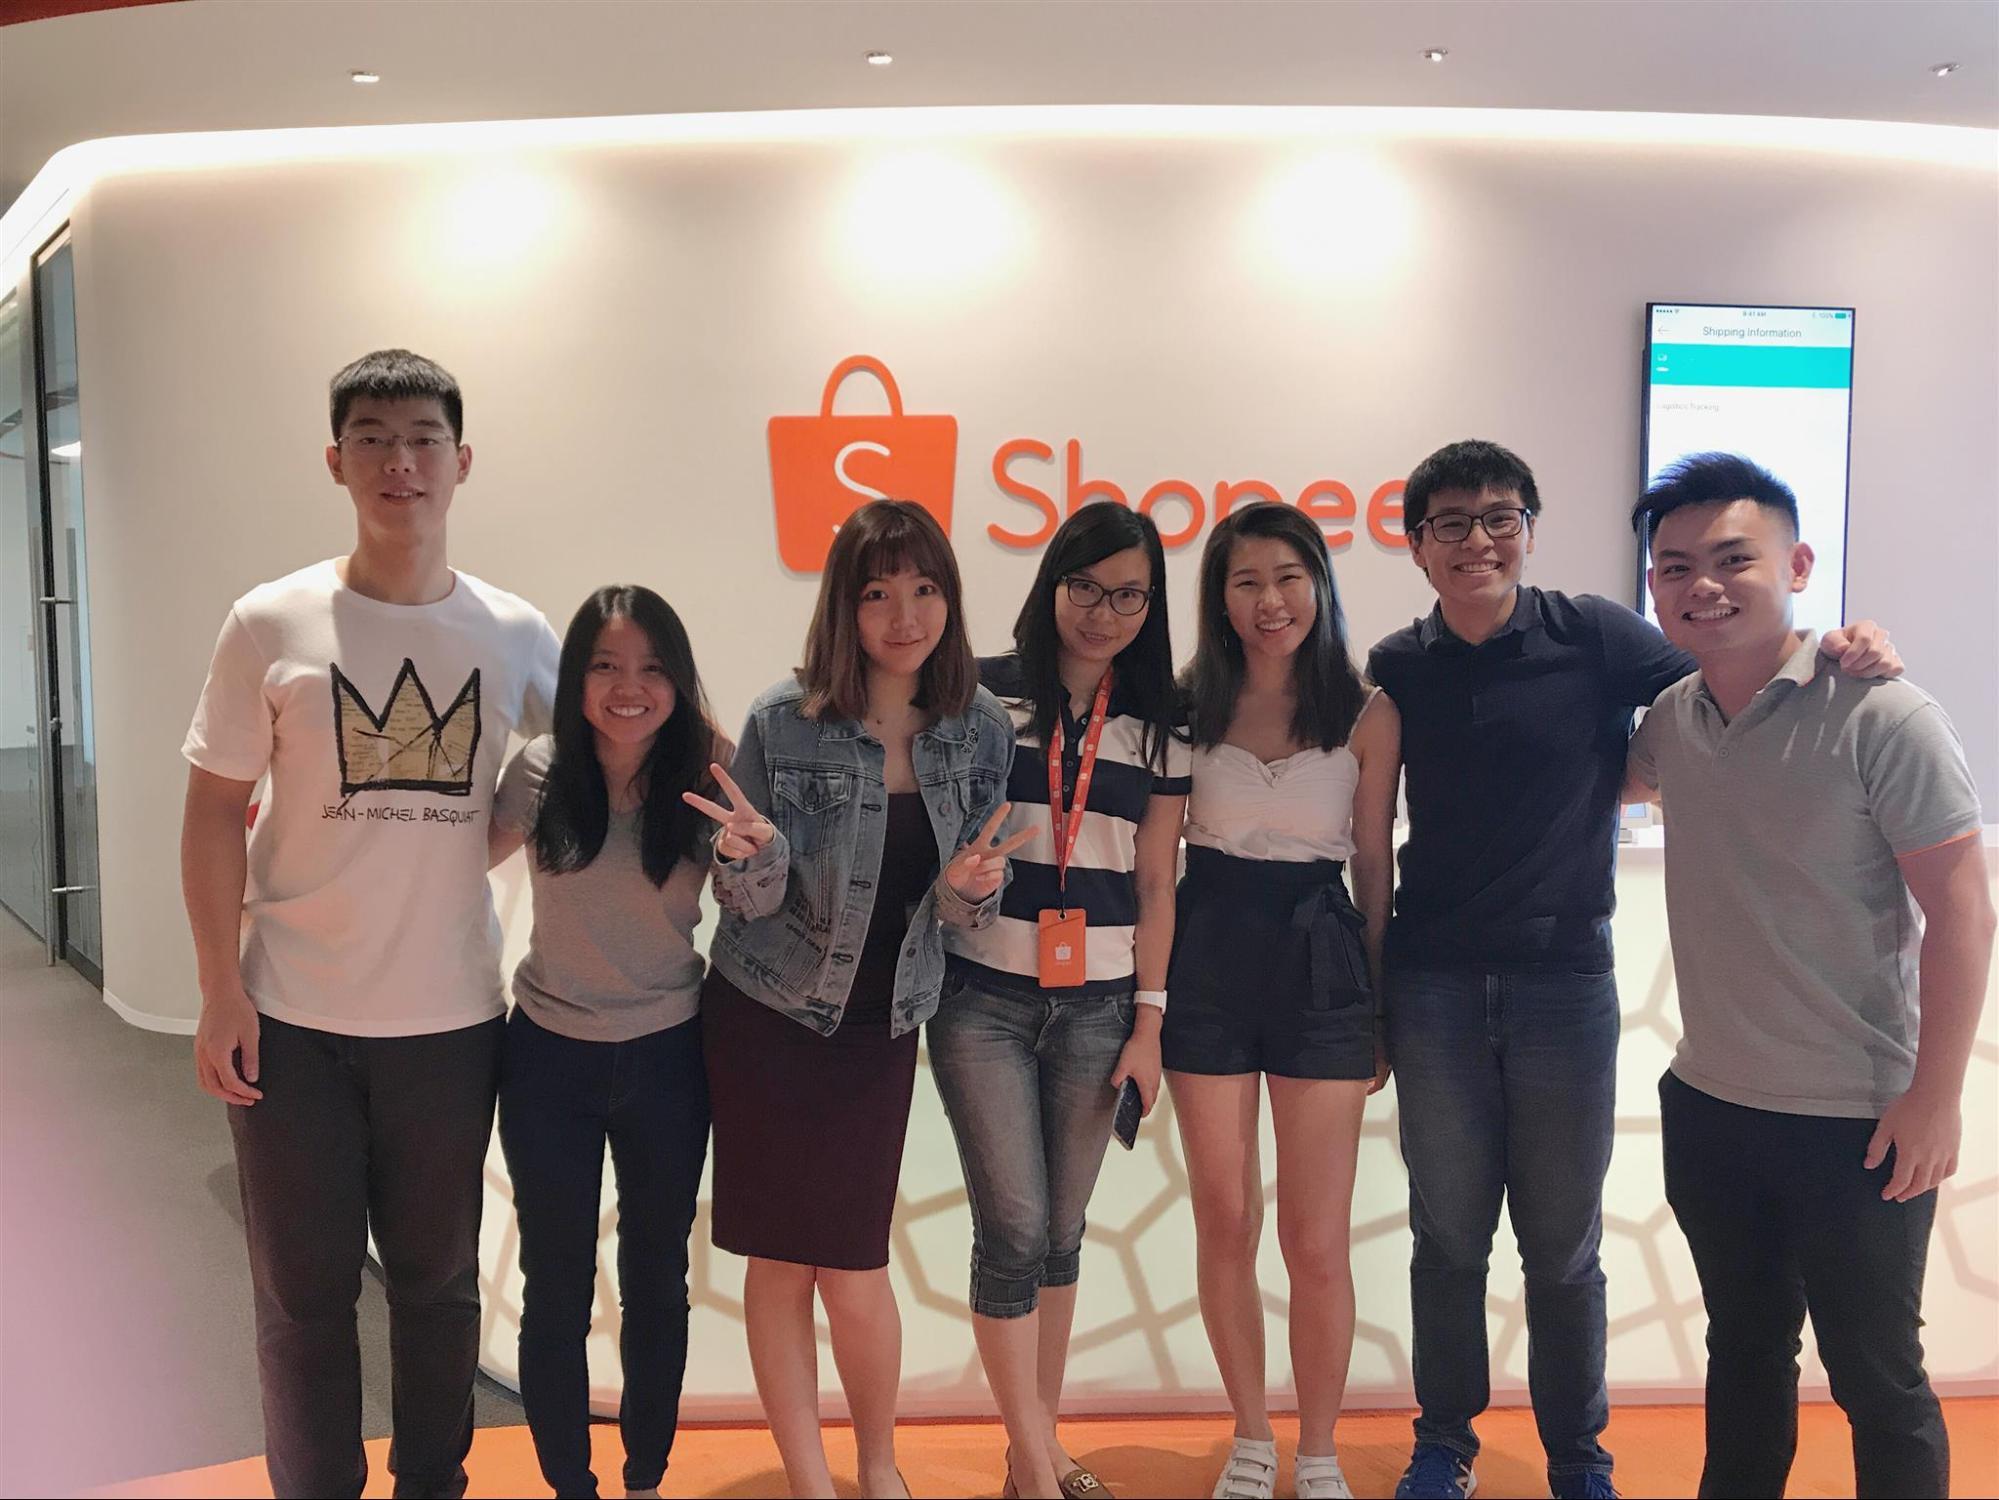 Shopee Career eCommerce Singapore Interview Lifeatshopee Auyong Yu Lin Enactus NTU Social Entrepreneurship Intute Intern Case Study